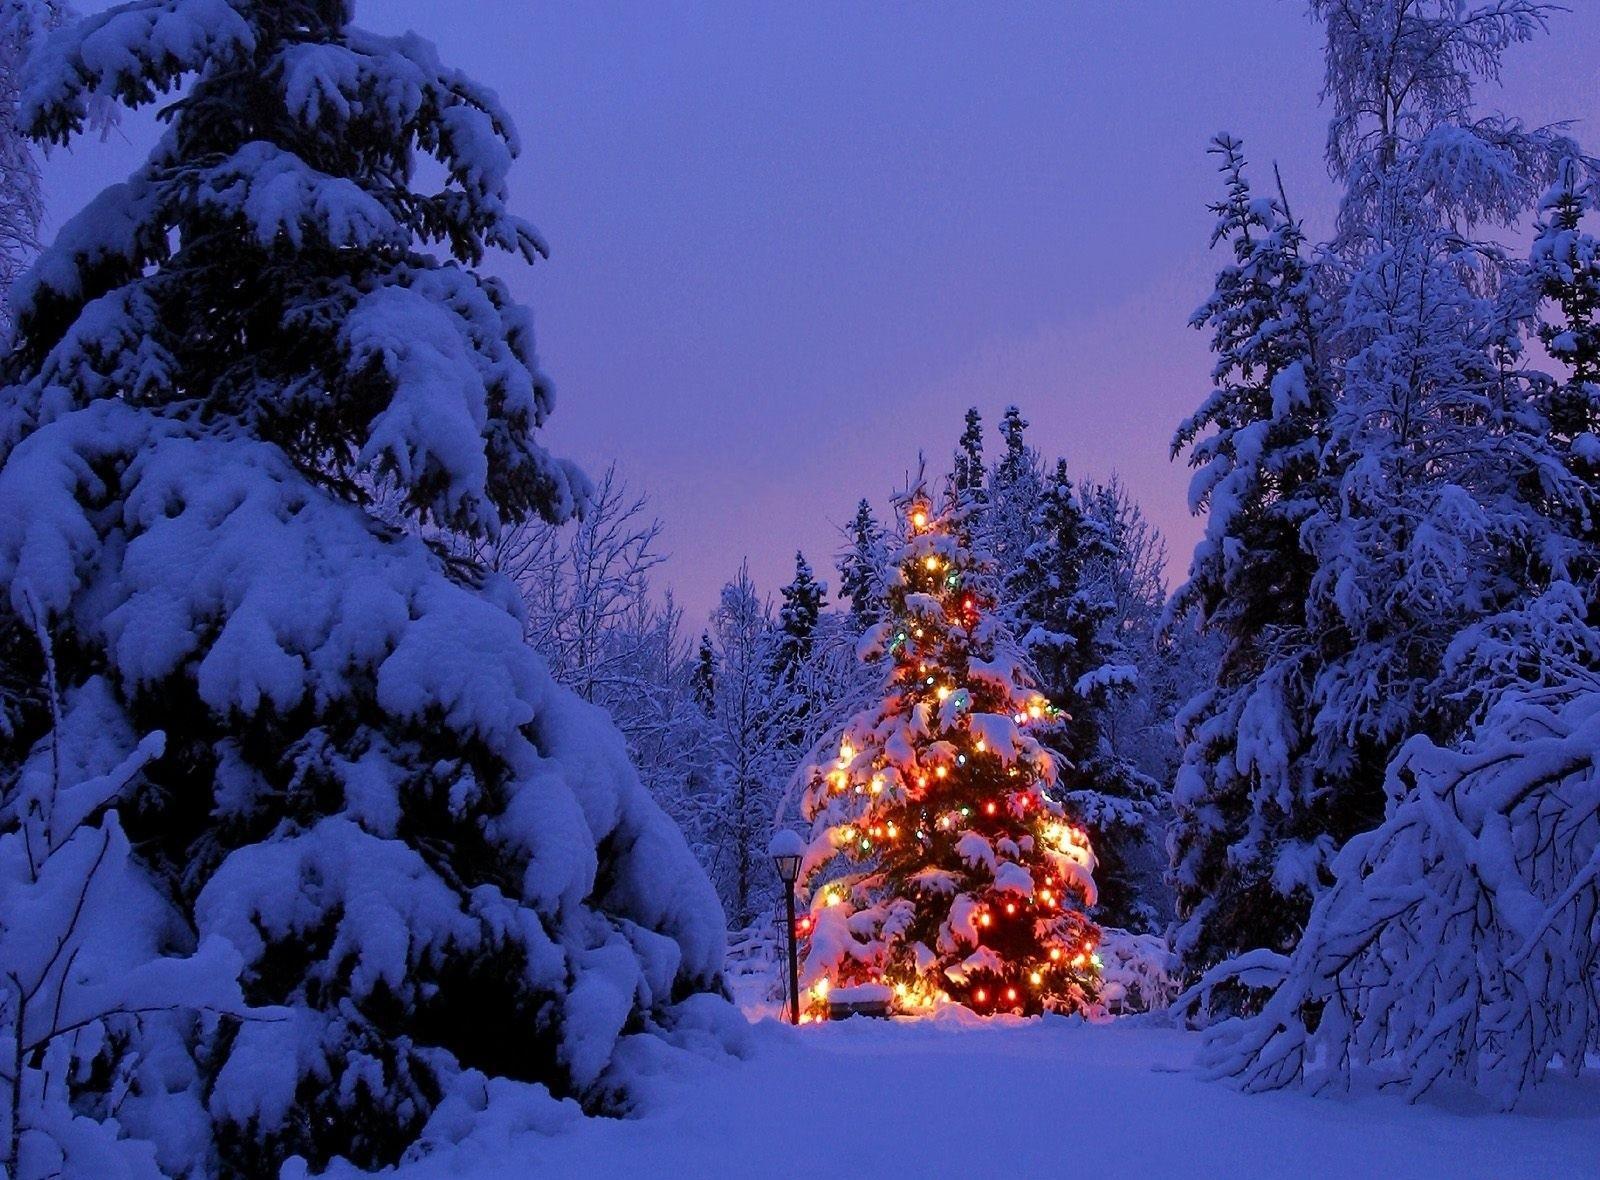 46 Lighted Christmas Tree Wallpaper On Wallpapersafari